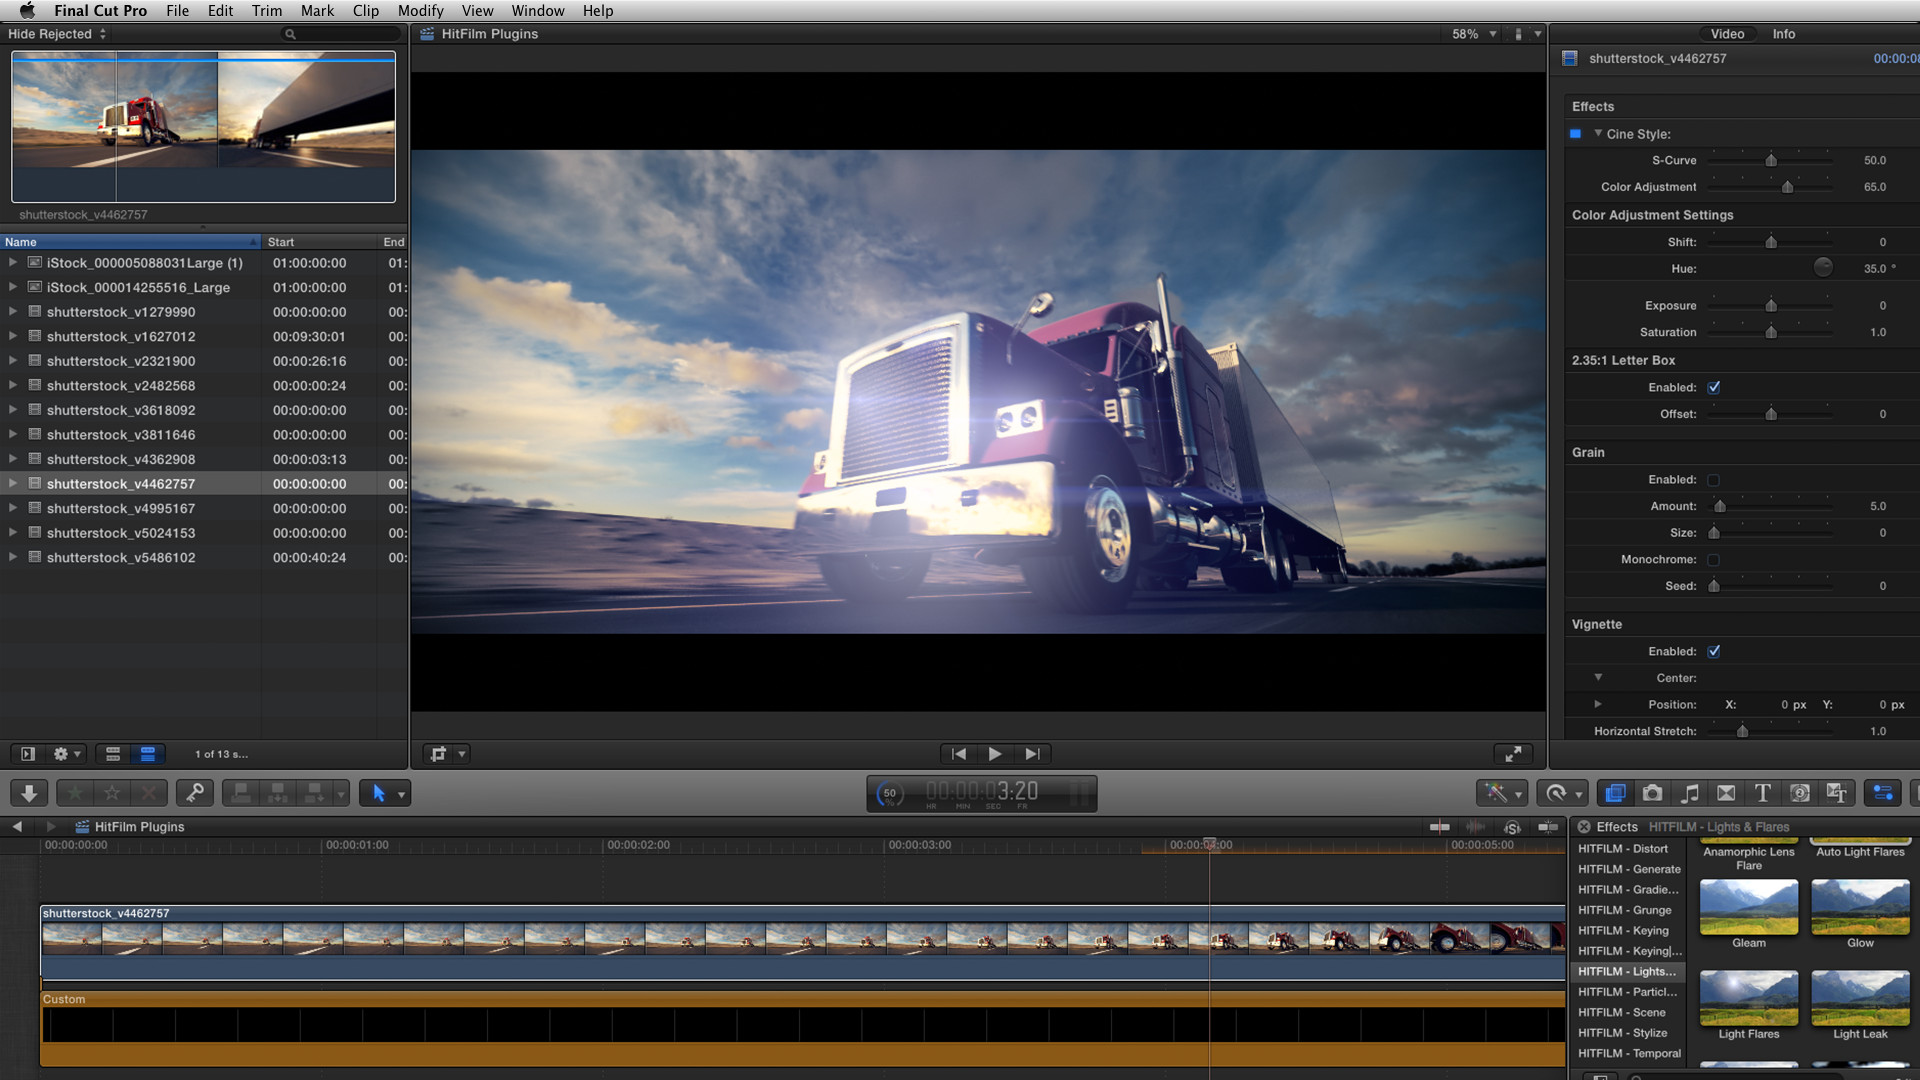 HitFilm Plugins for FCP X